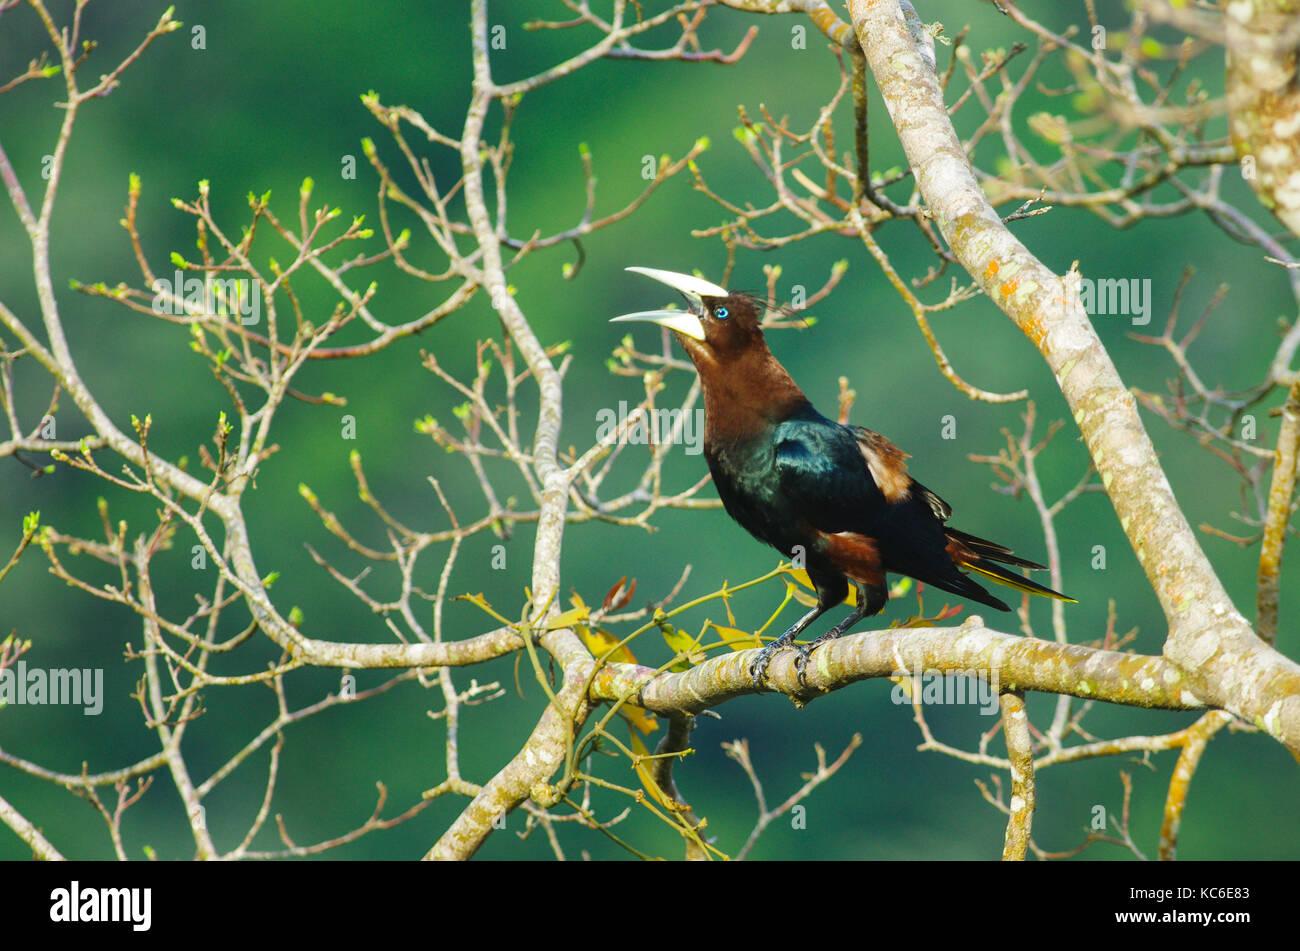 Chestnut-headed oropendola big bird on a tree branch - Stock Image